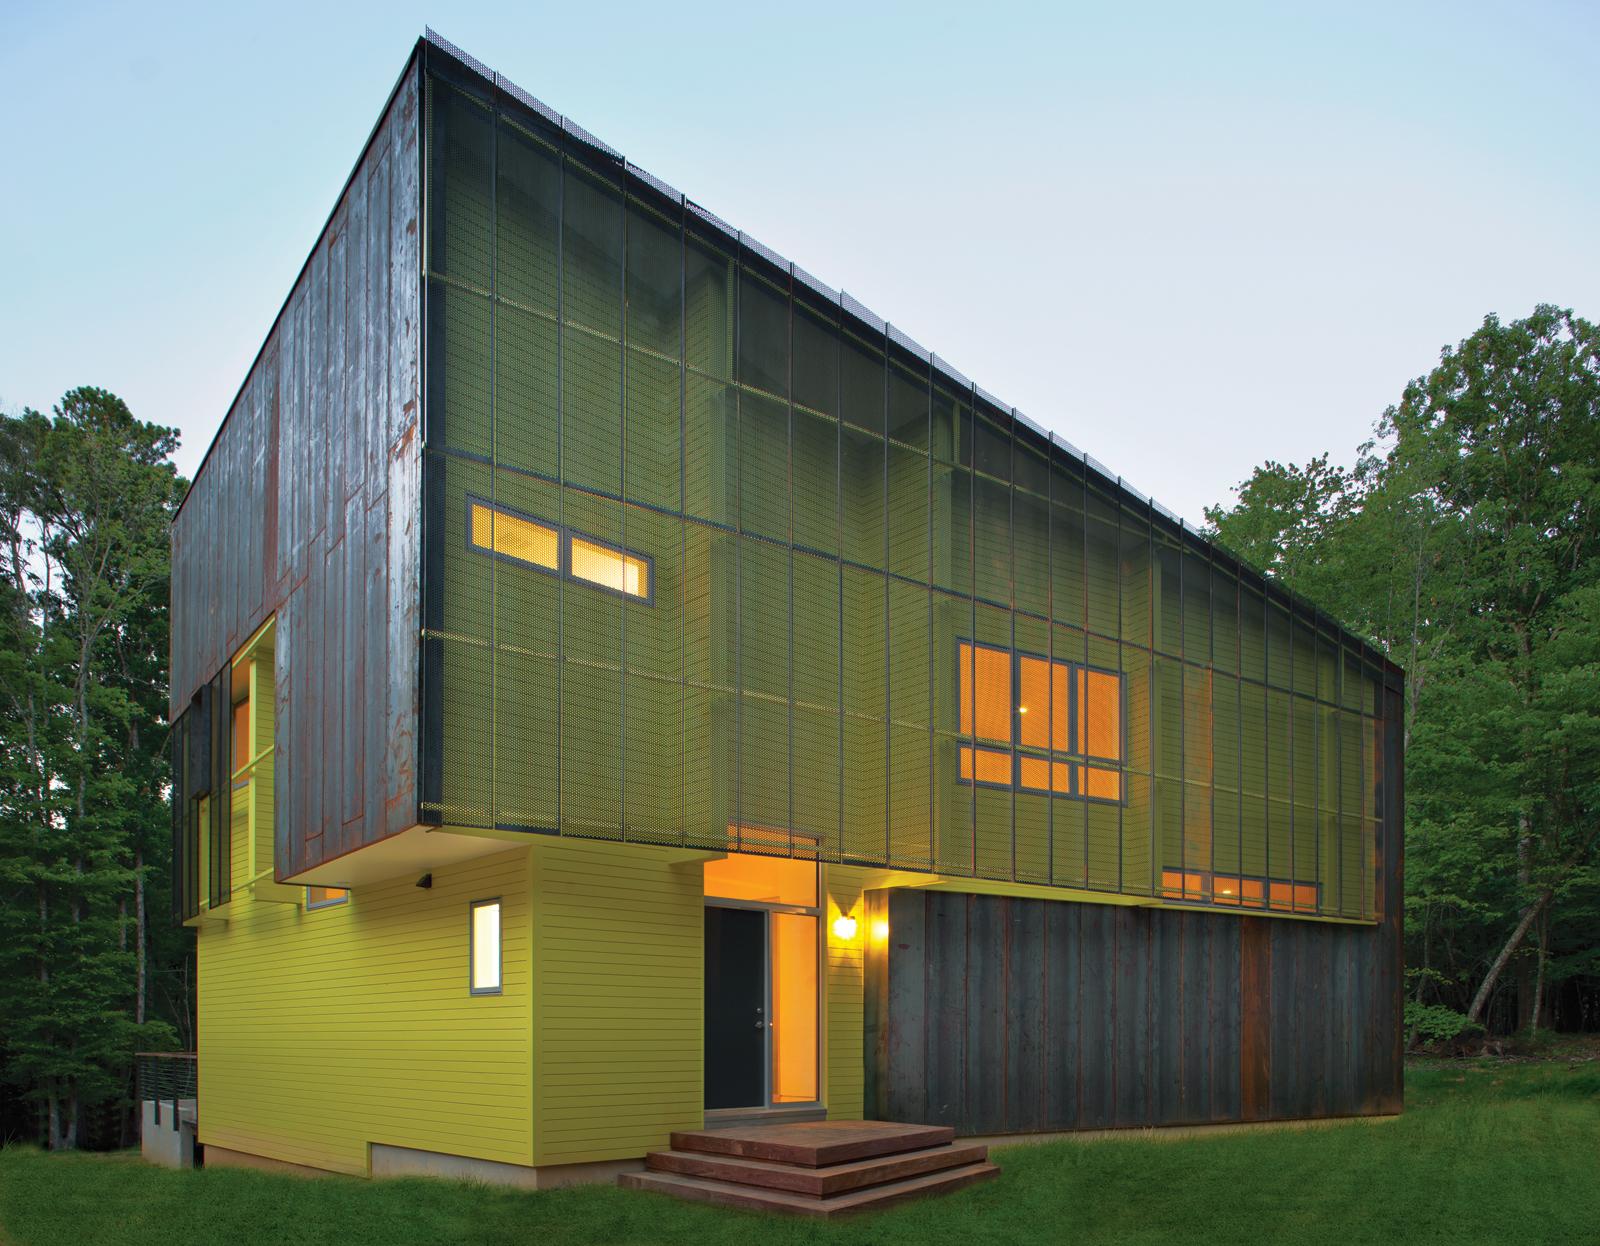 Affordable green housing in North Carolina